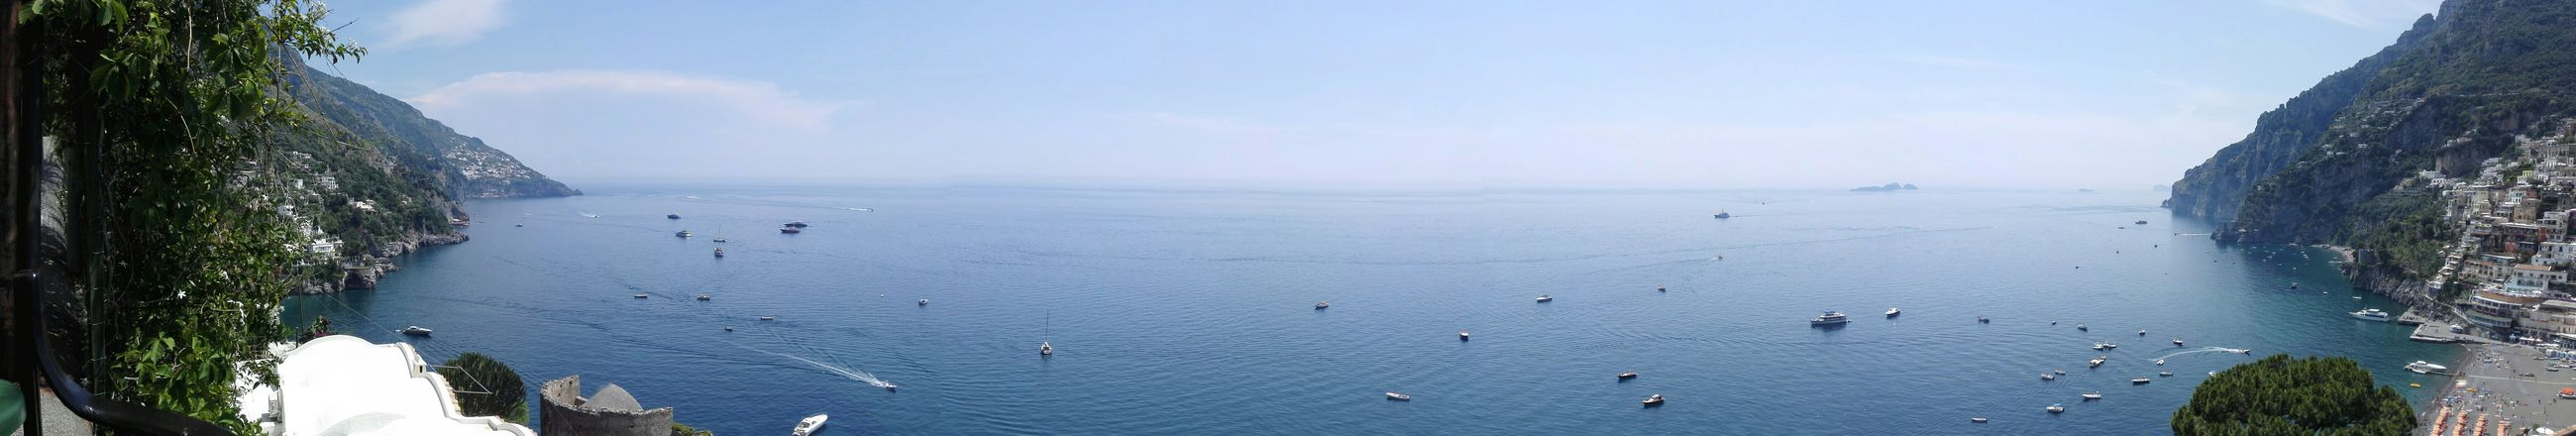 Enjoying Life Taking Photos Relaxing Sea Sea View Positano Ig_positano Wonderful Italy Costieraamalfitana